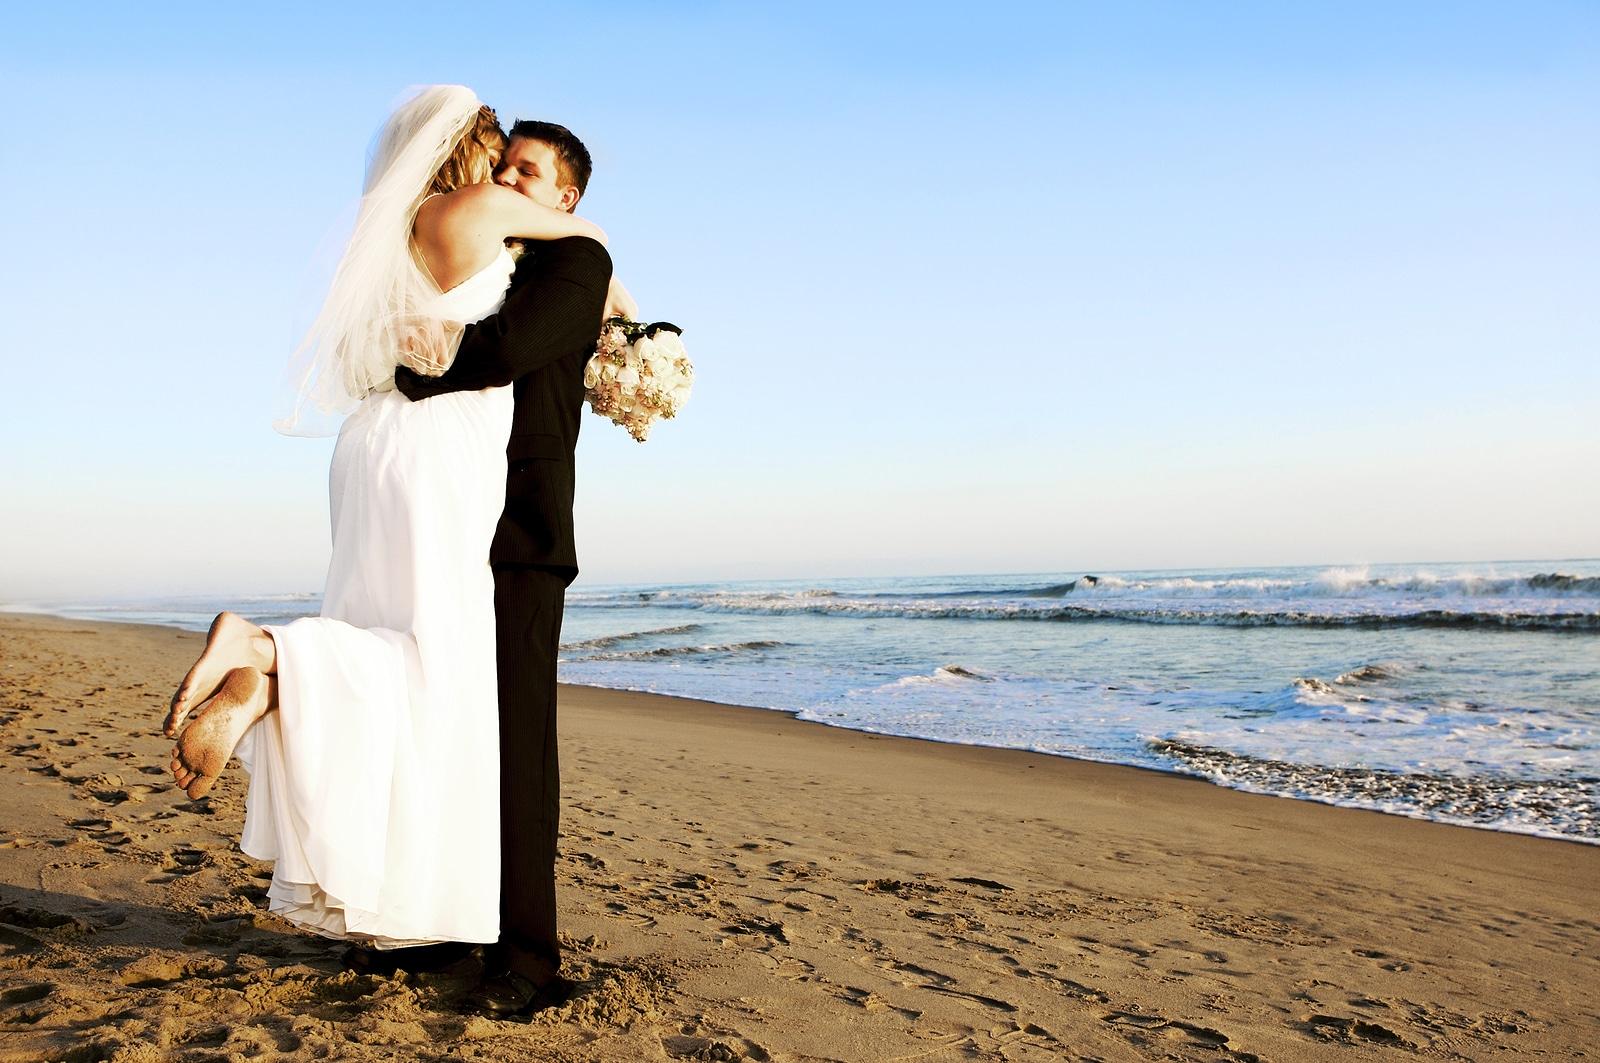 Celebra tu boda en la playa con Hacienda Encantada